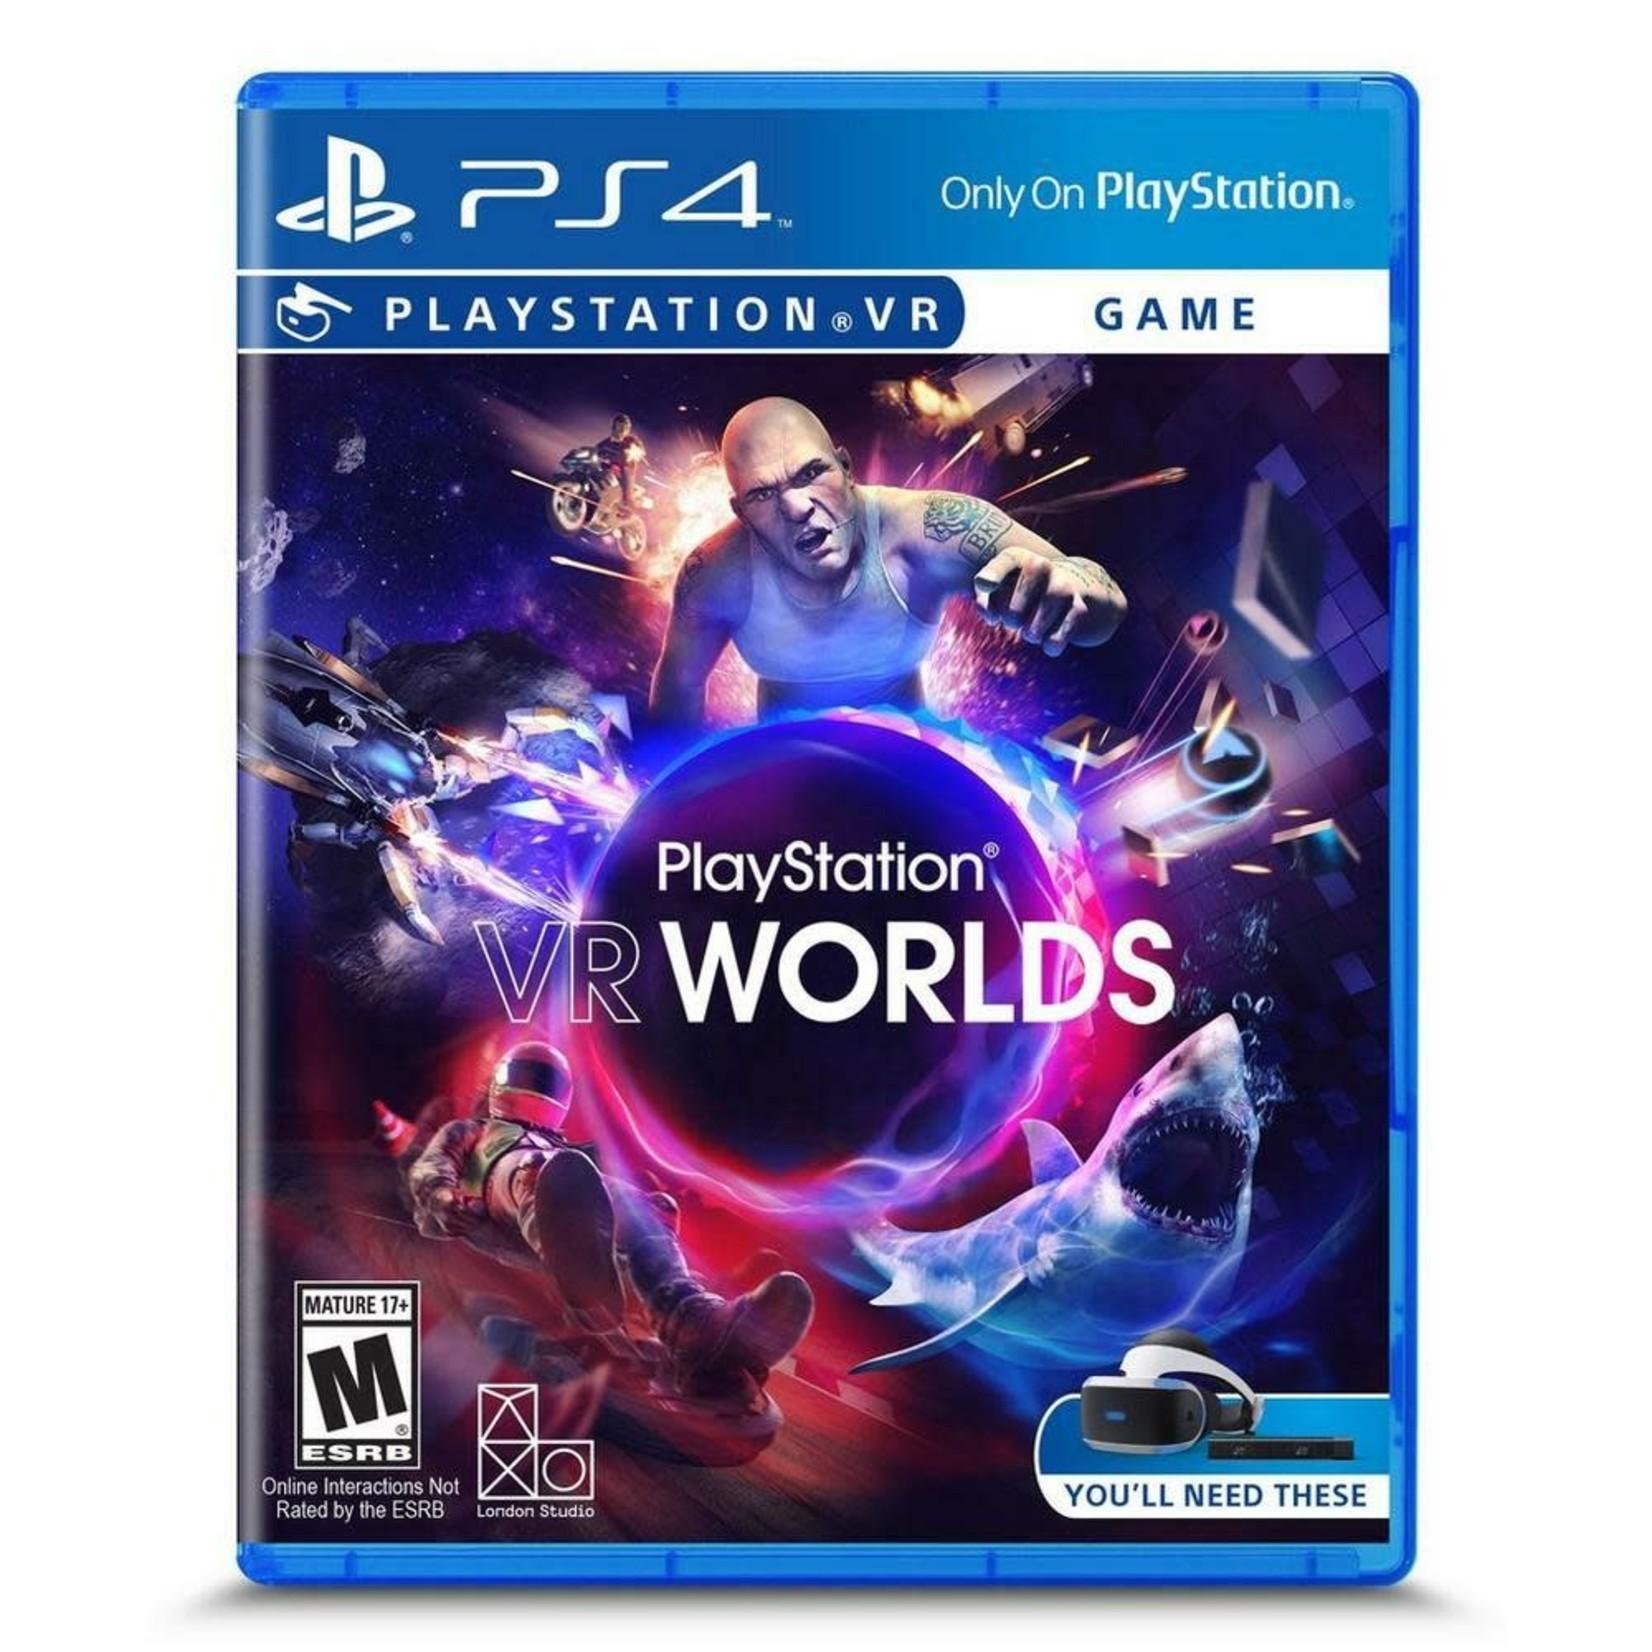 PS4U-PLAYSTATION VR WORLDS